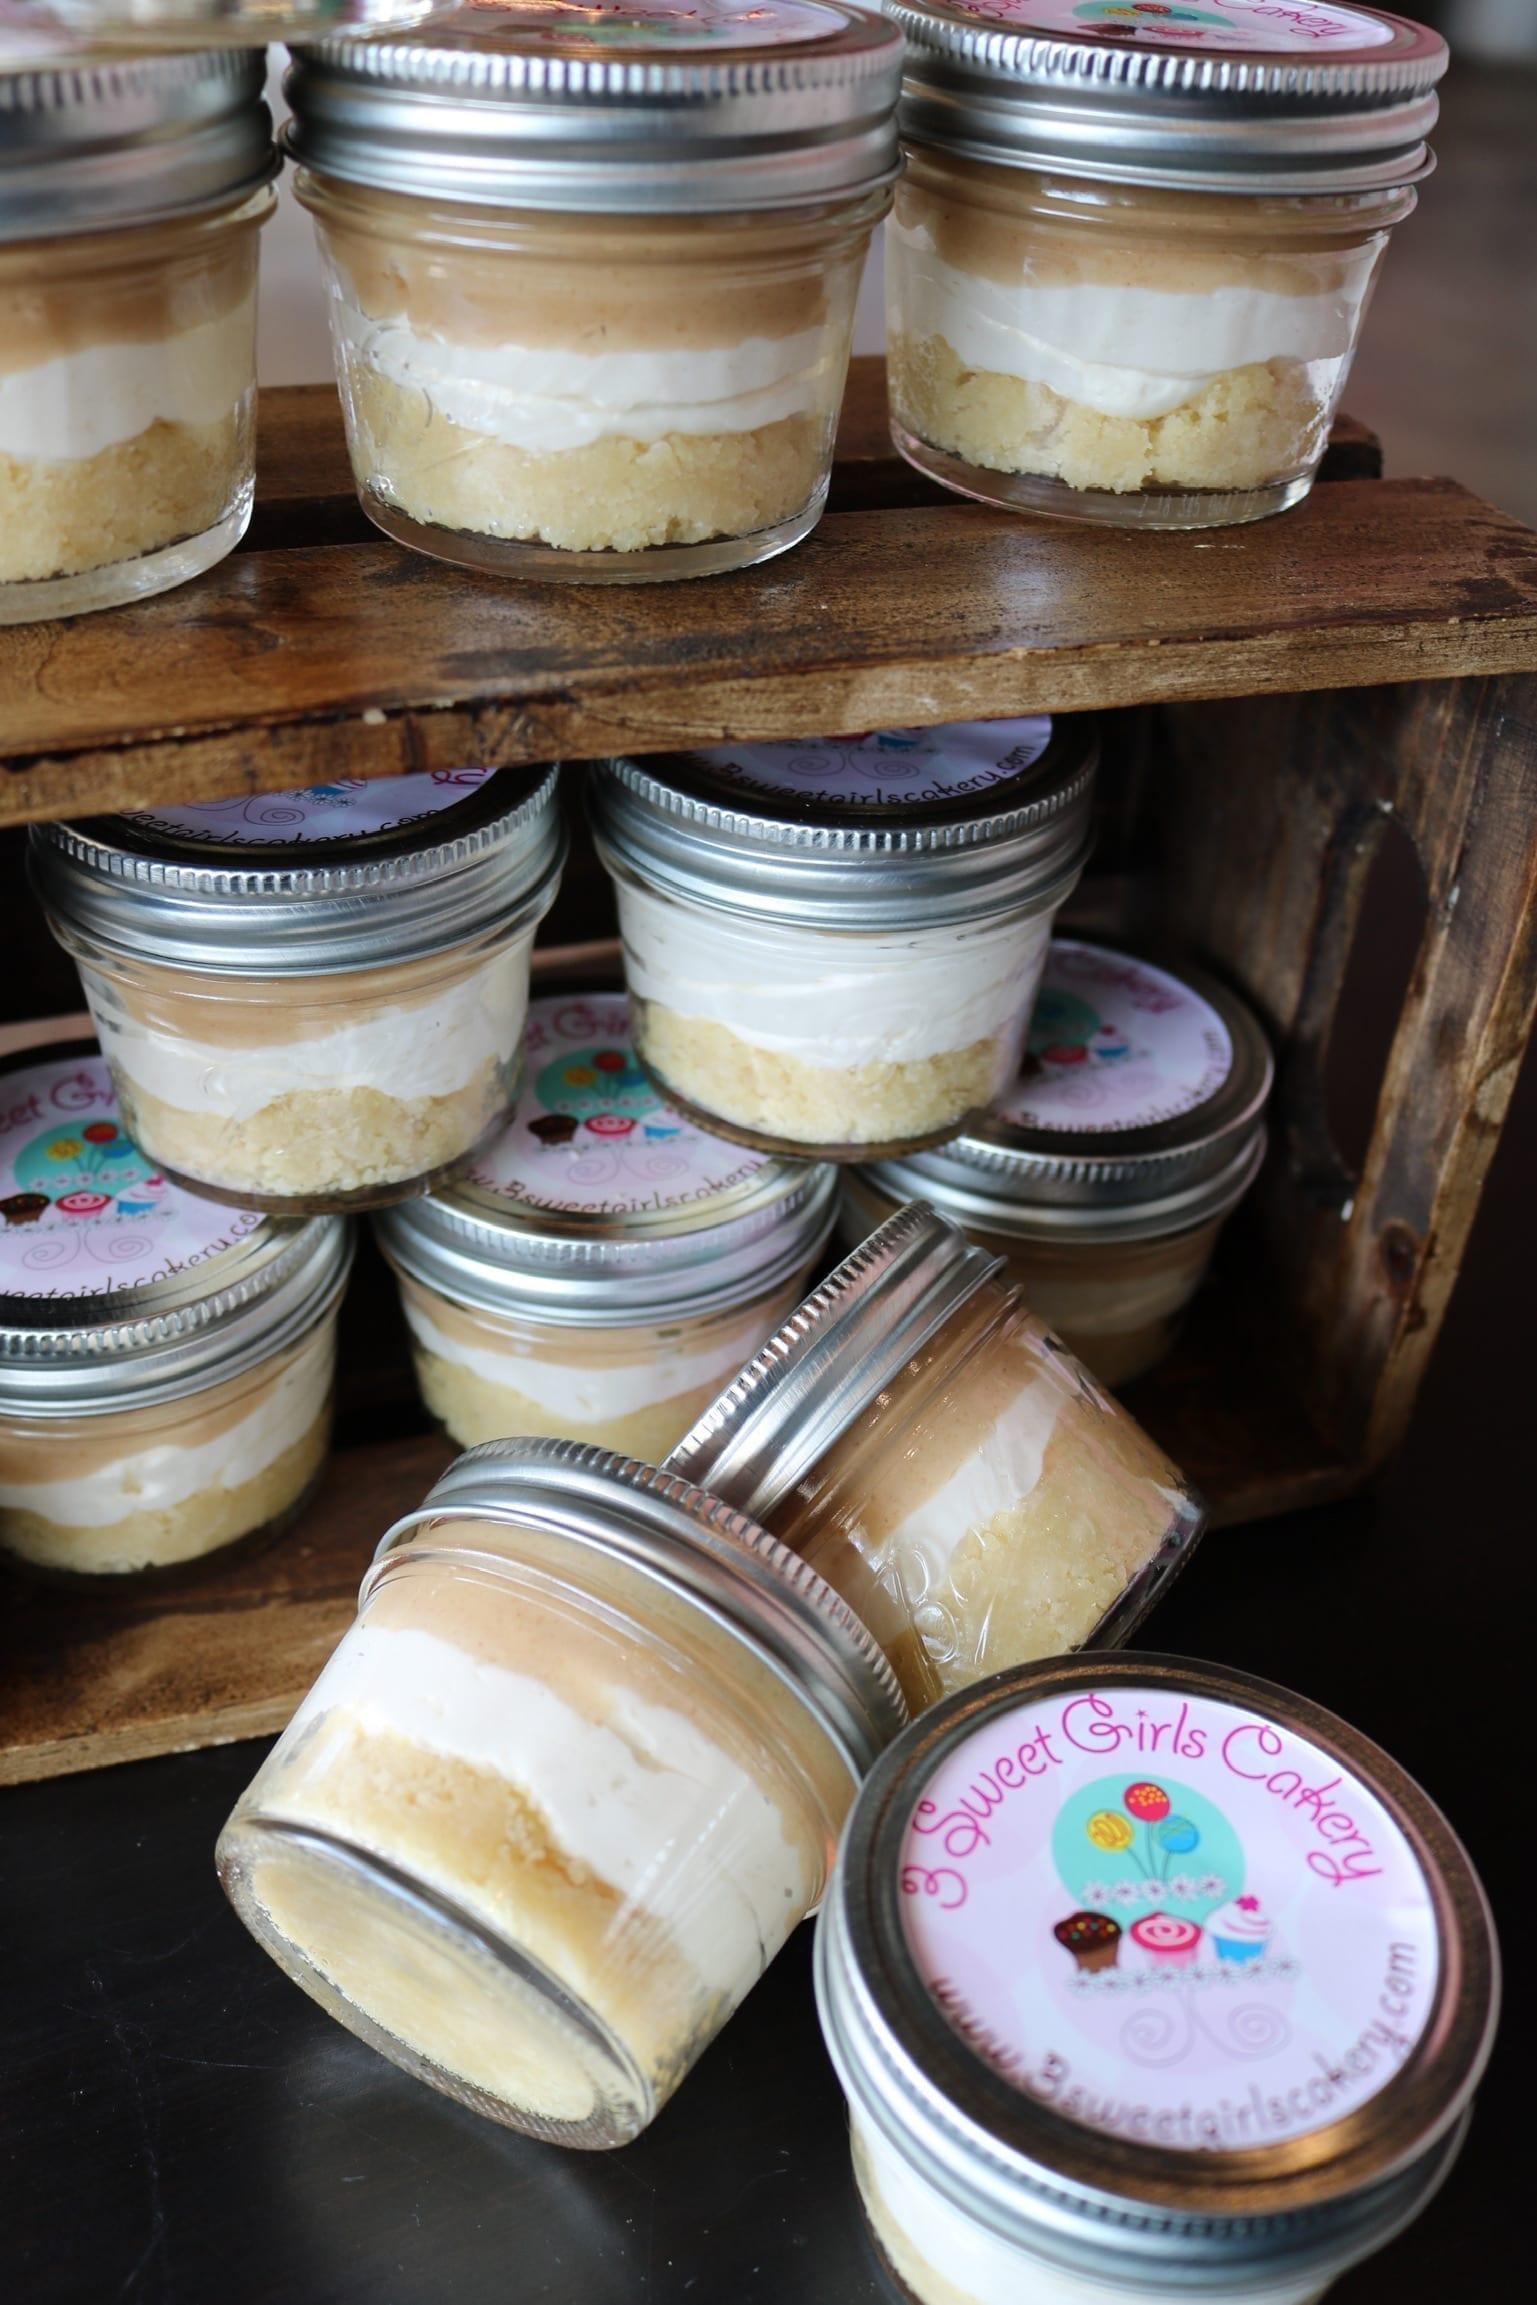 Keto Salted Caramel Cheesecake in a Jar | 3 Sweet Girls Cakery